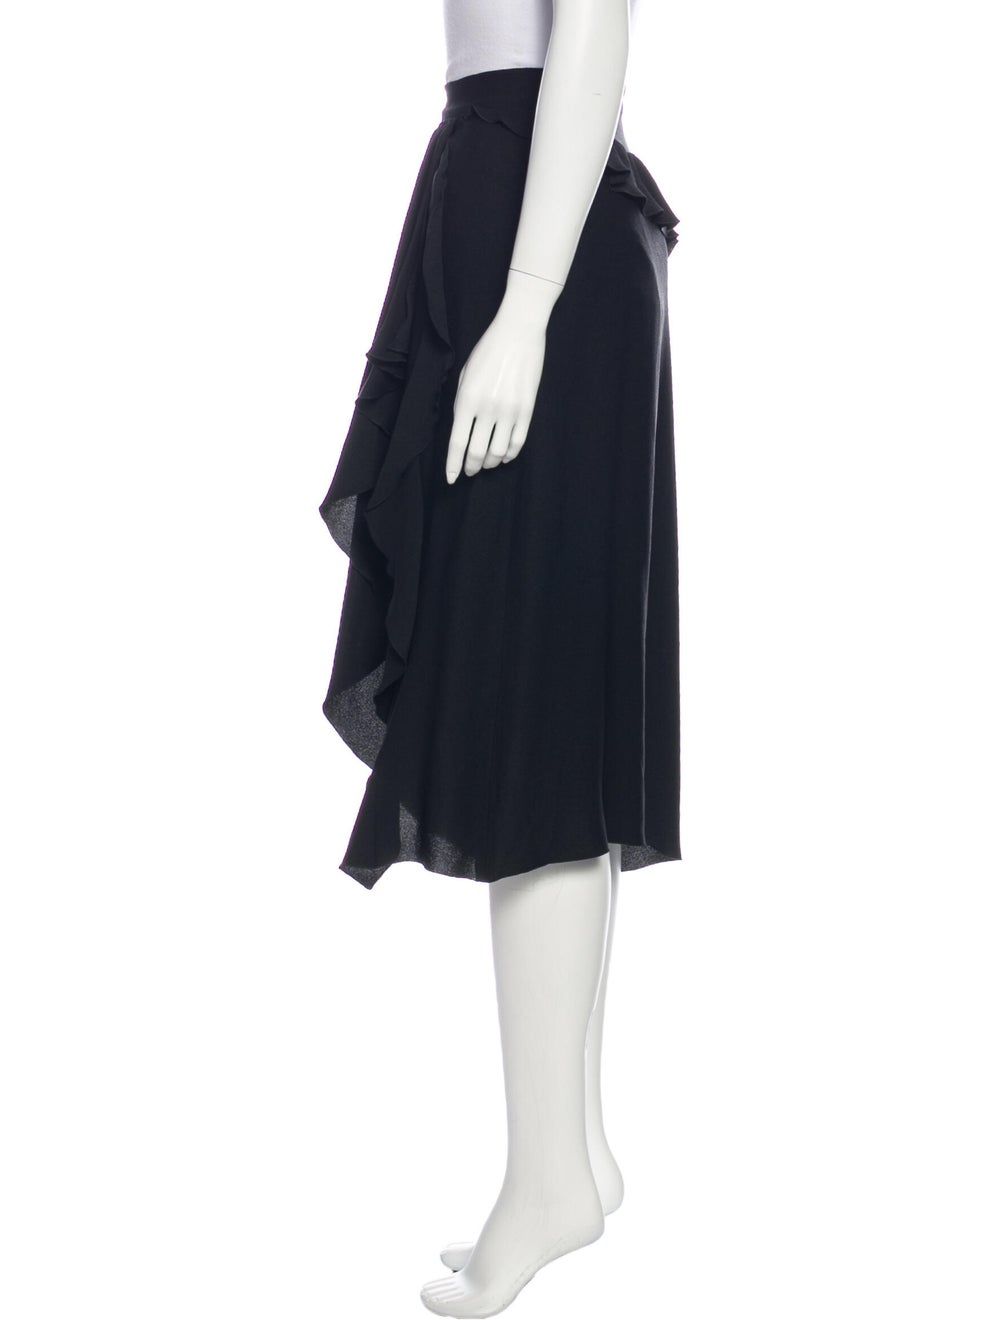 Altuzarra Midi Length Skirt Black - image 2